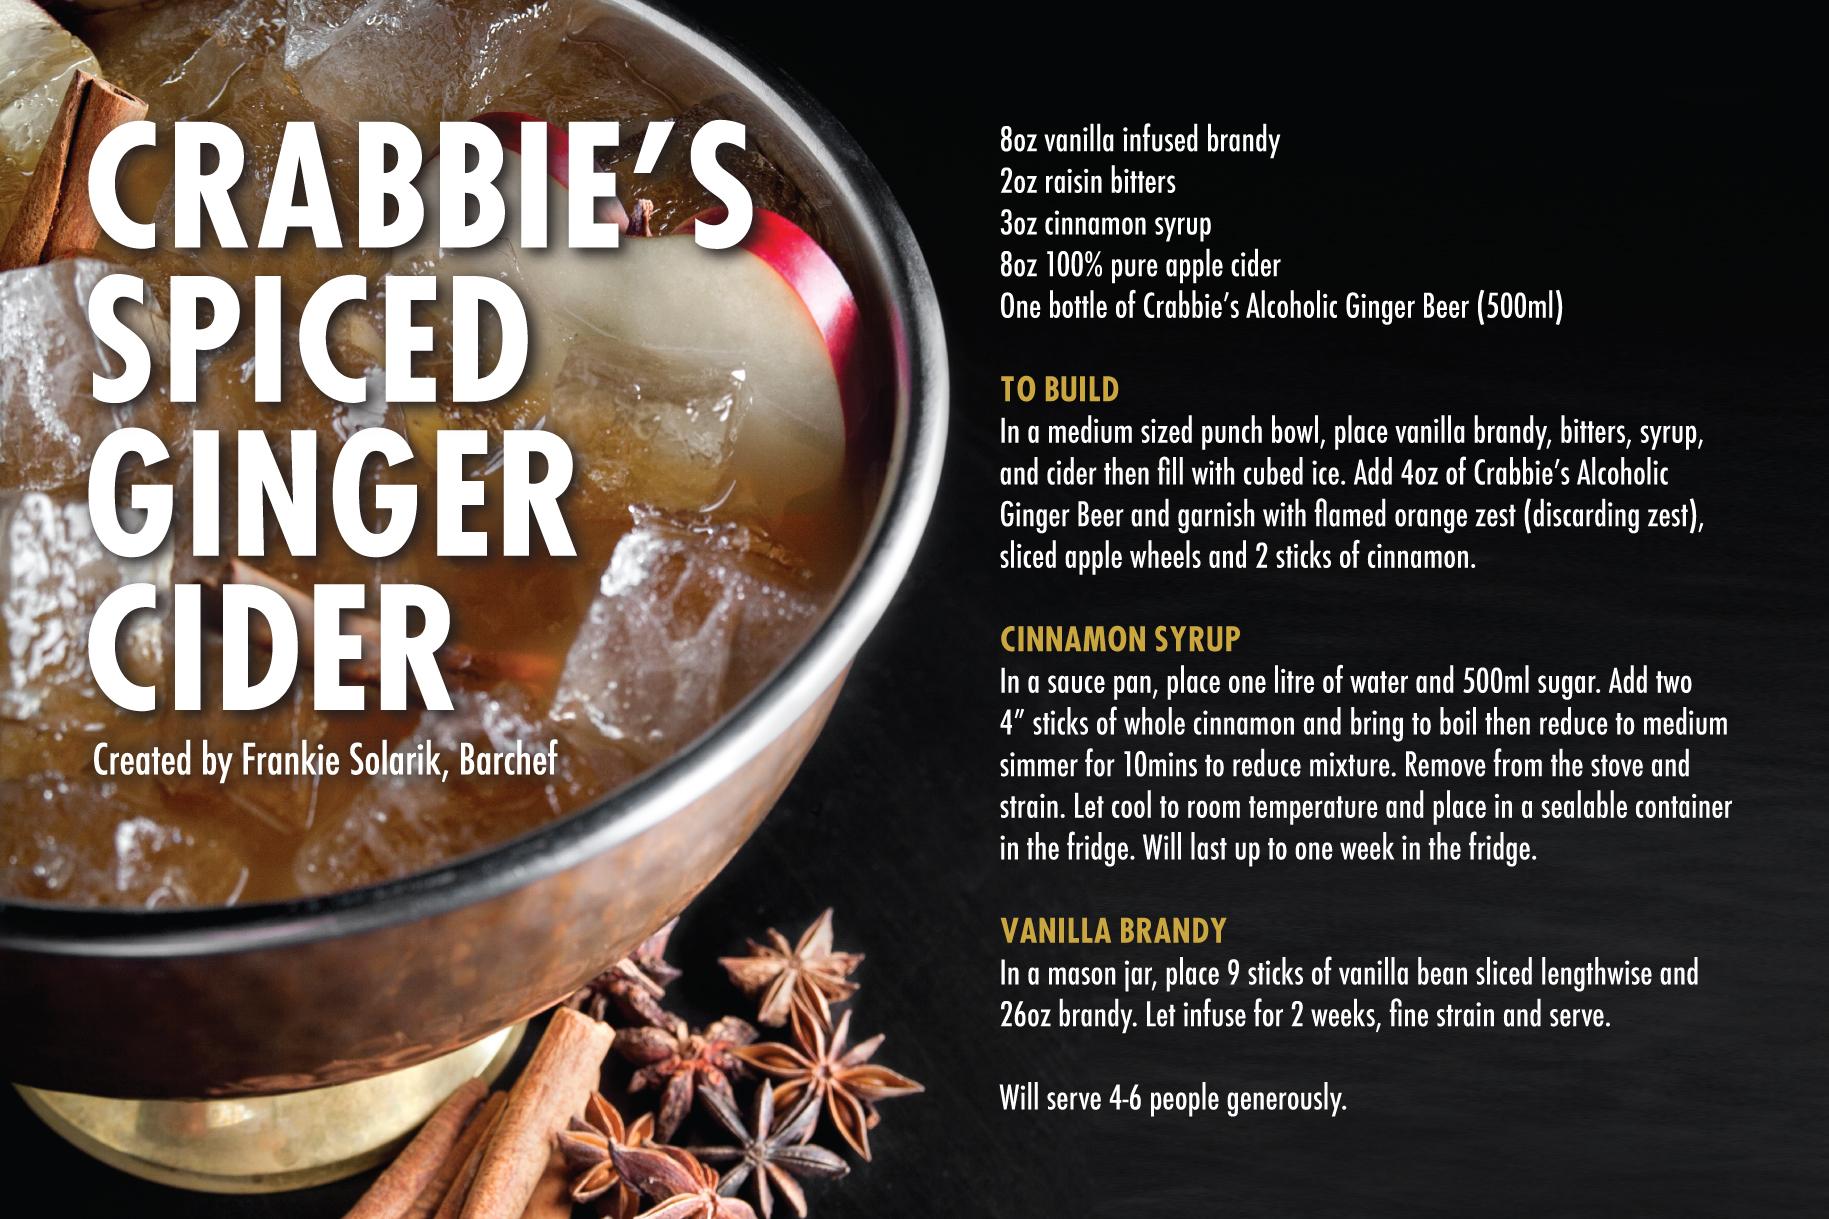 Crabbie's Spiced Ginger Cider - Recipe Card